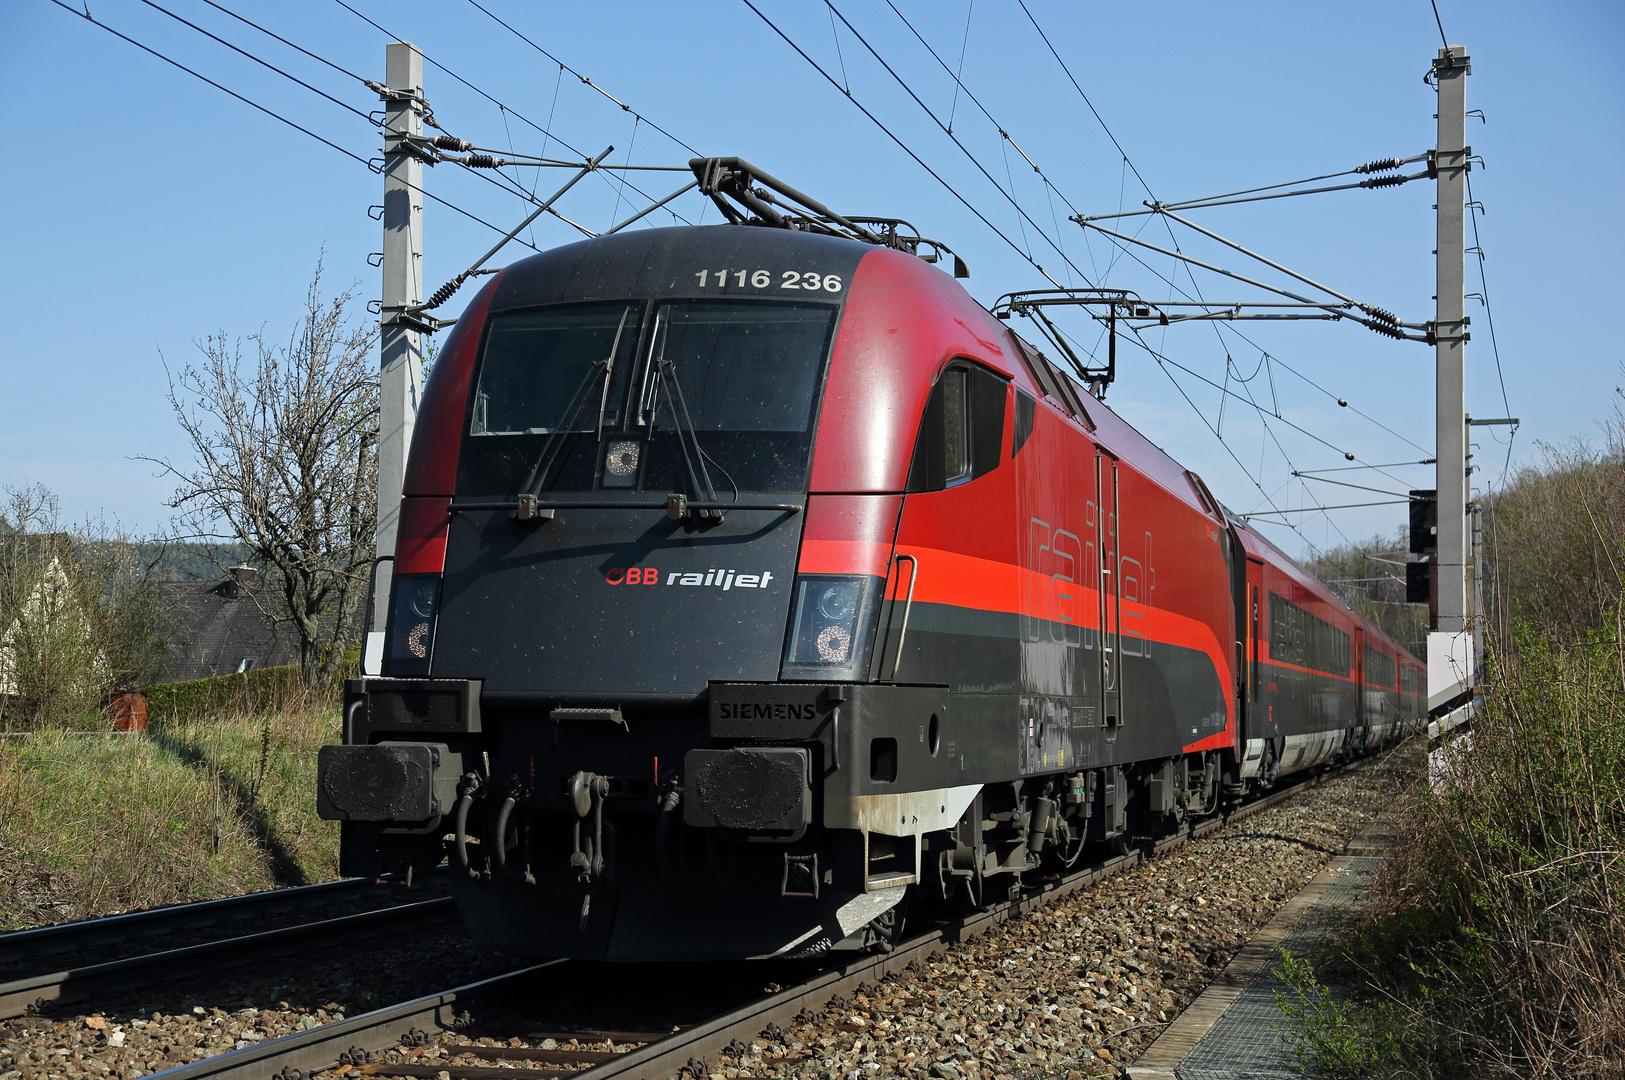 'railjet 1116 236'